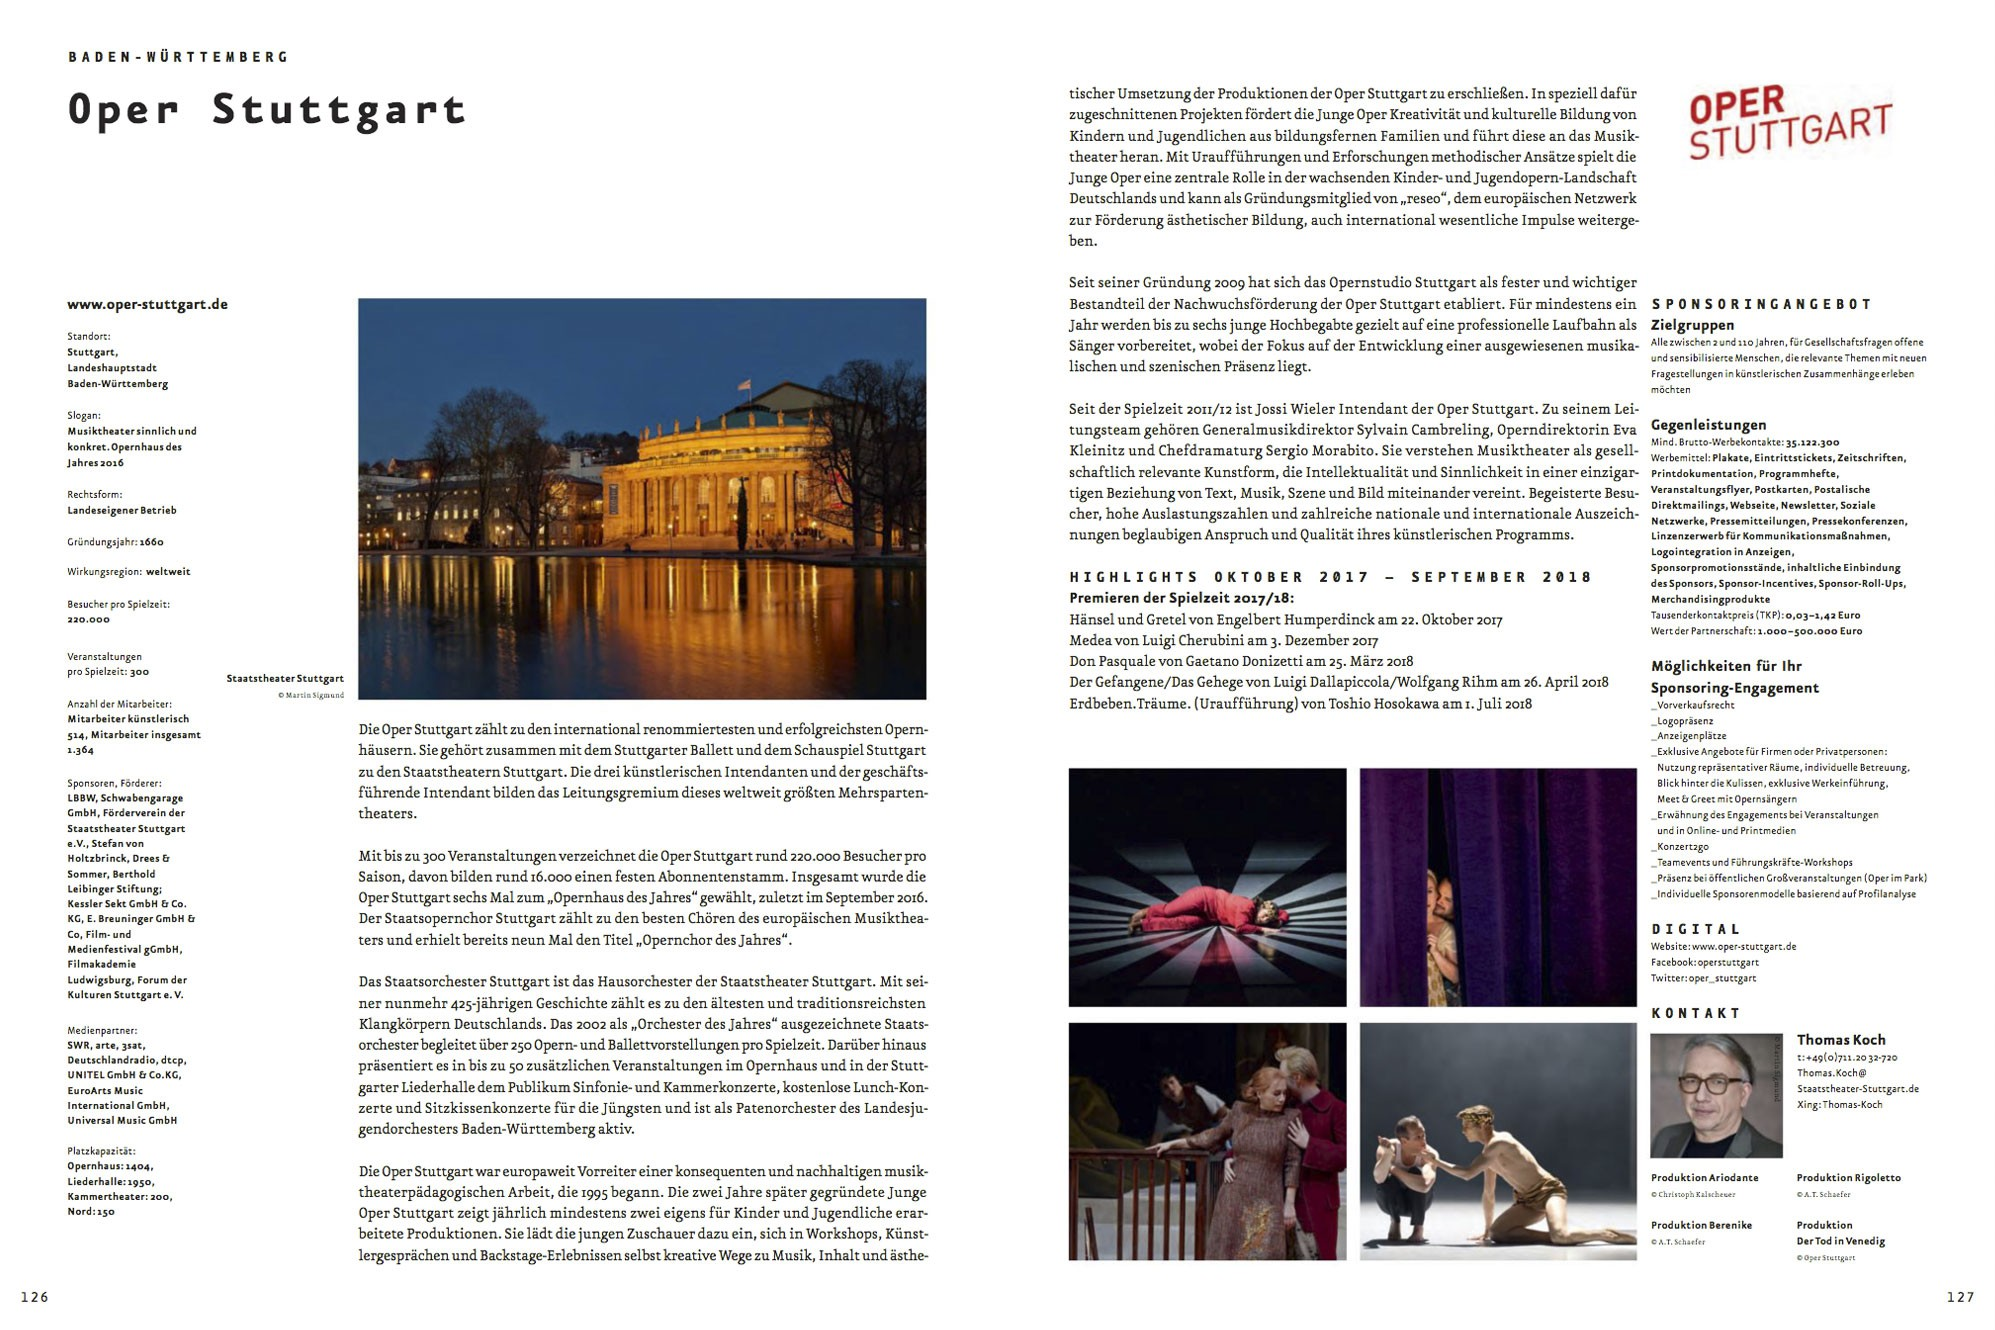 _causales-jahrbuch-2018-kulturmarken-xplicit-berlin_2